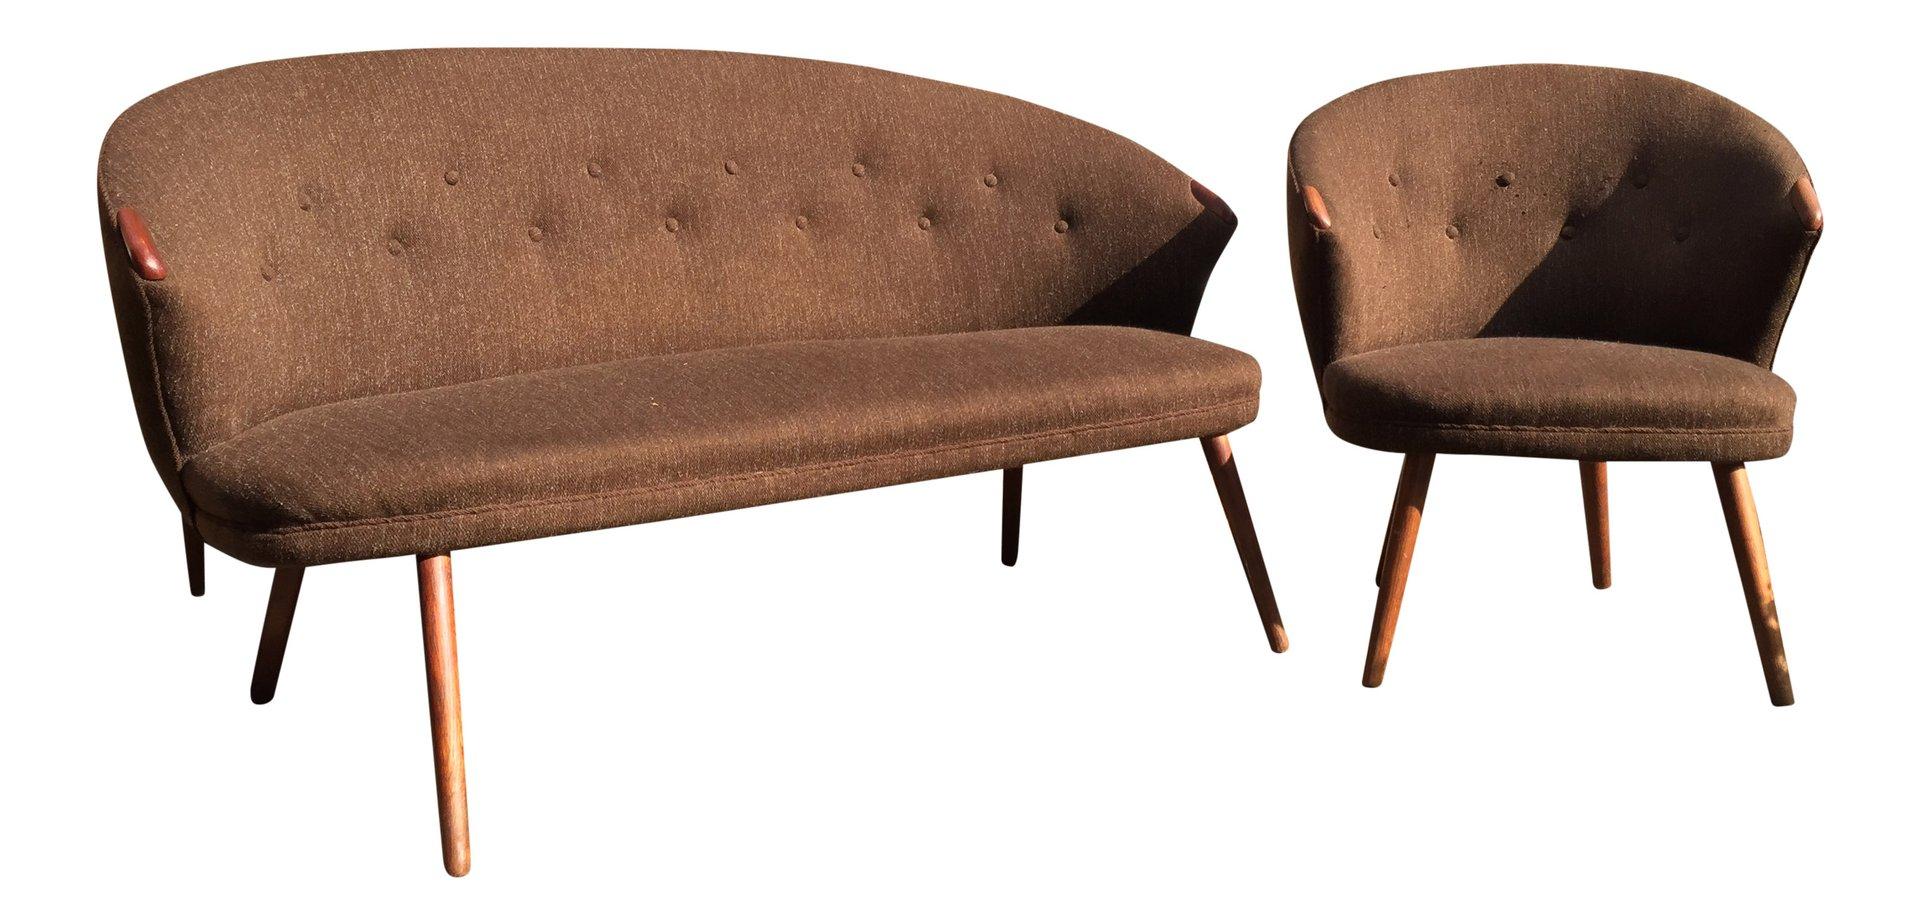 Vintage sofa und sessel 1960er bei pamono kaufen for Vintage sessel berlin